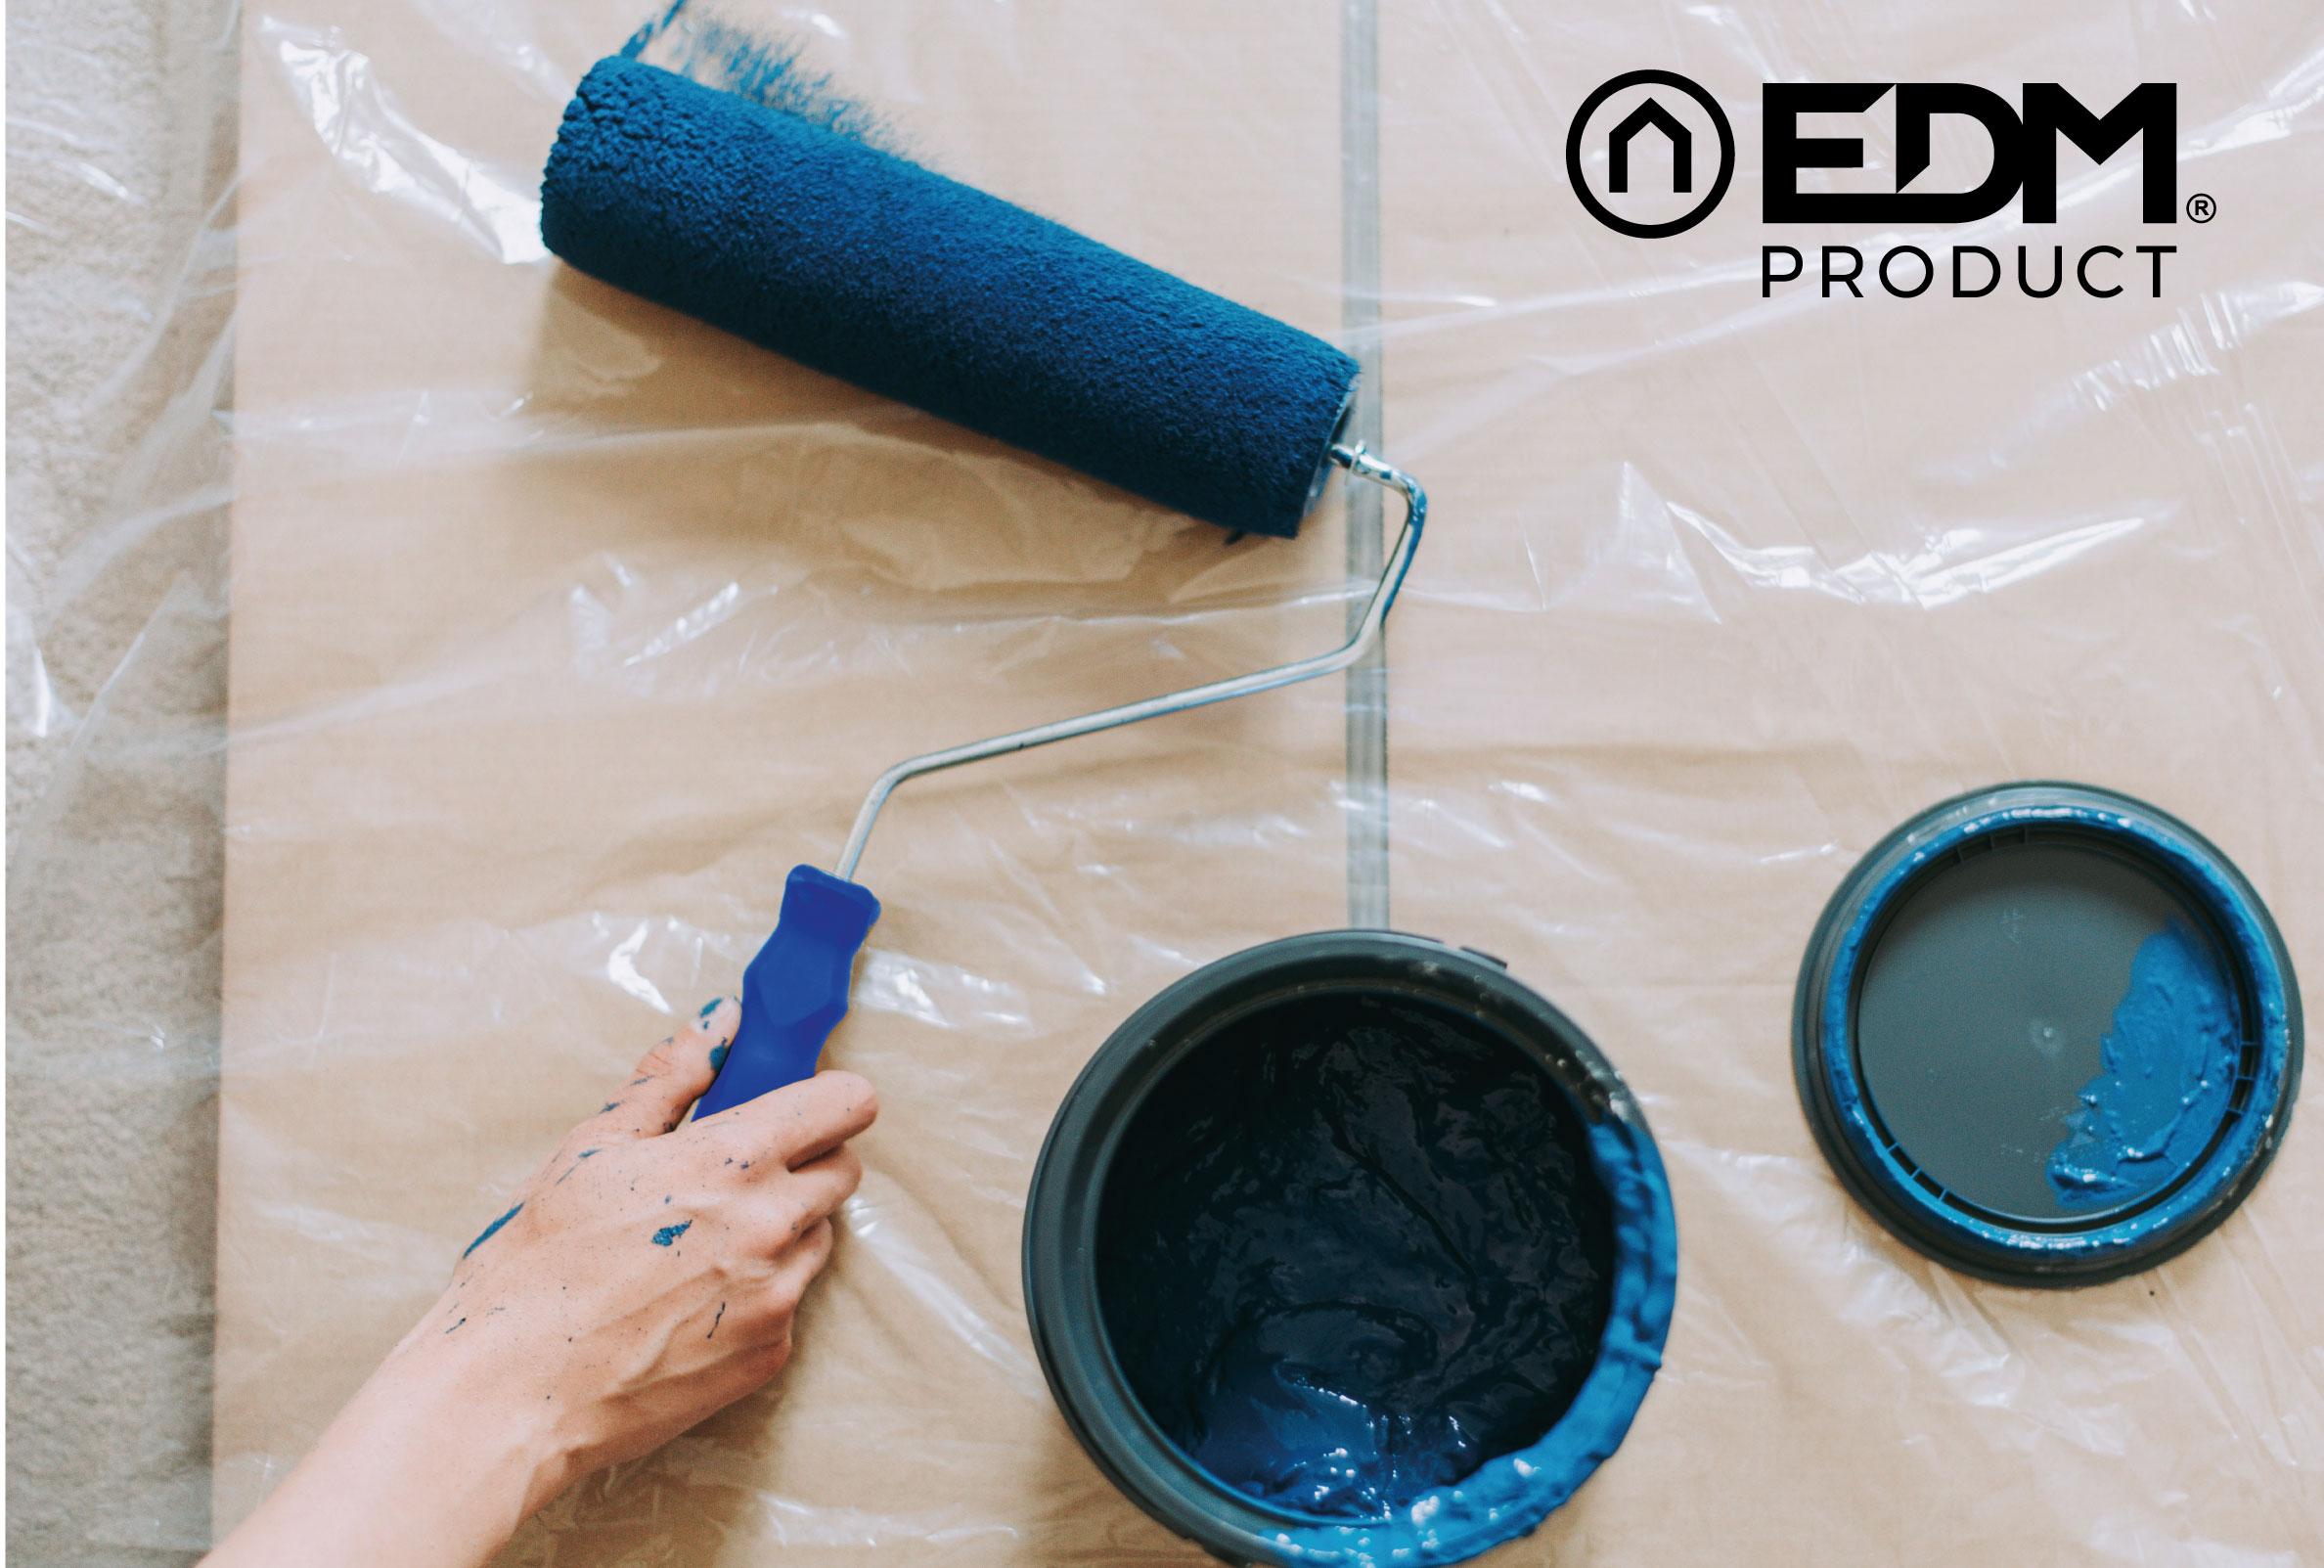 New range of EDM paint accessories